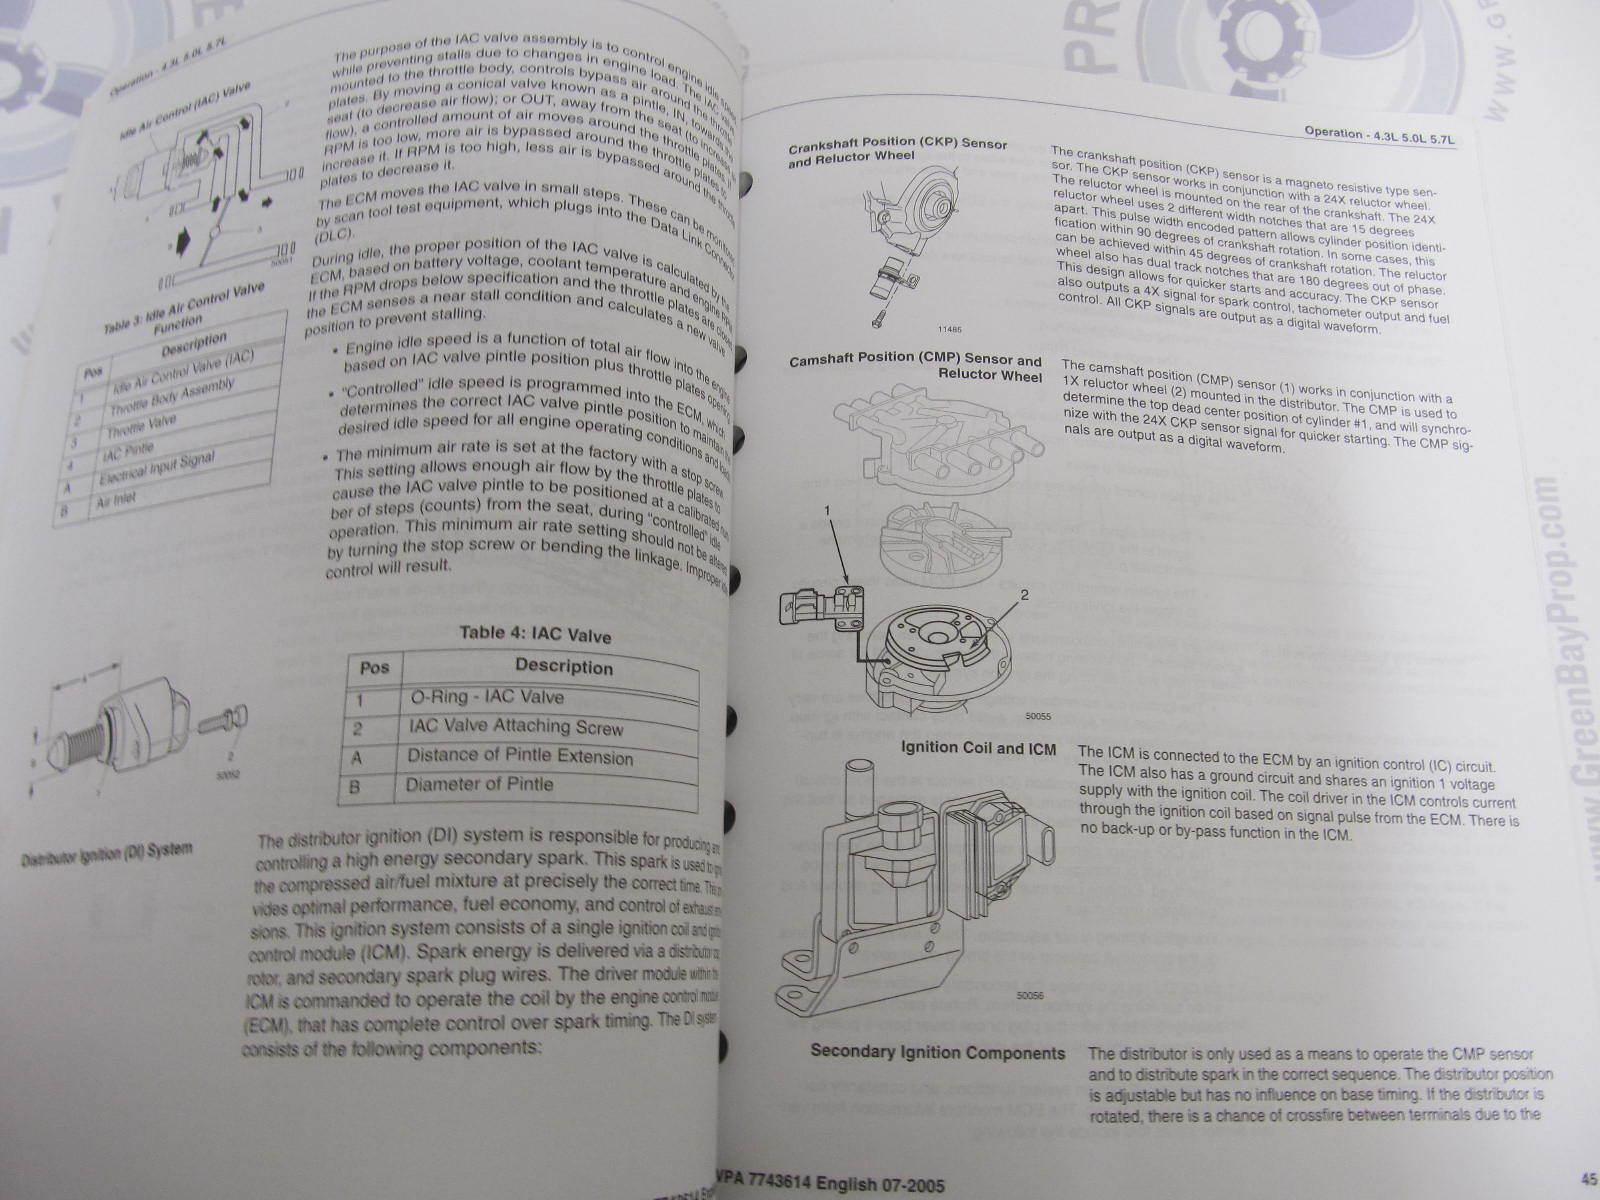 Volvo aq 250 sterndrive manual ebook array volvo penta 2002 manuale u2013 idea di immagine auto rh auto kaybueno com fandeluxe Choice Image